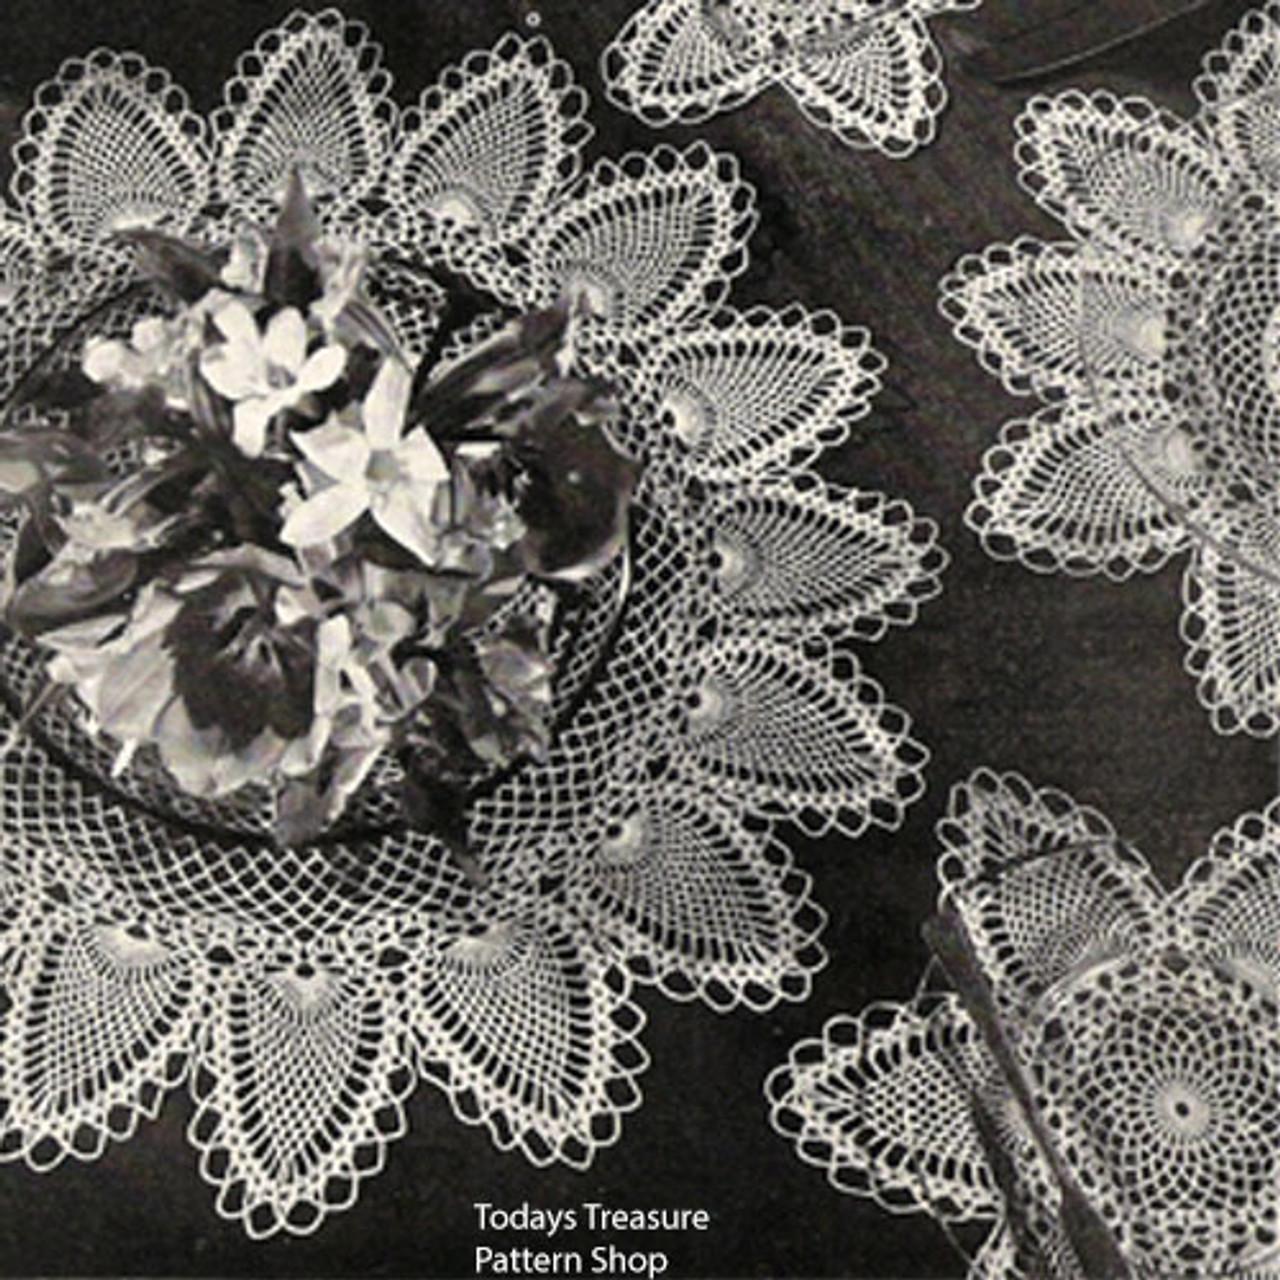 Crocheted Pineapple Doily Mats Pattern